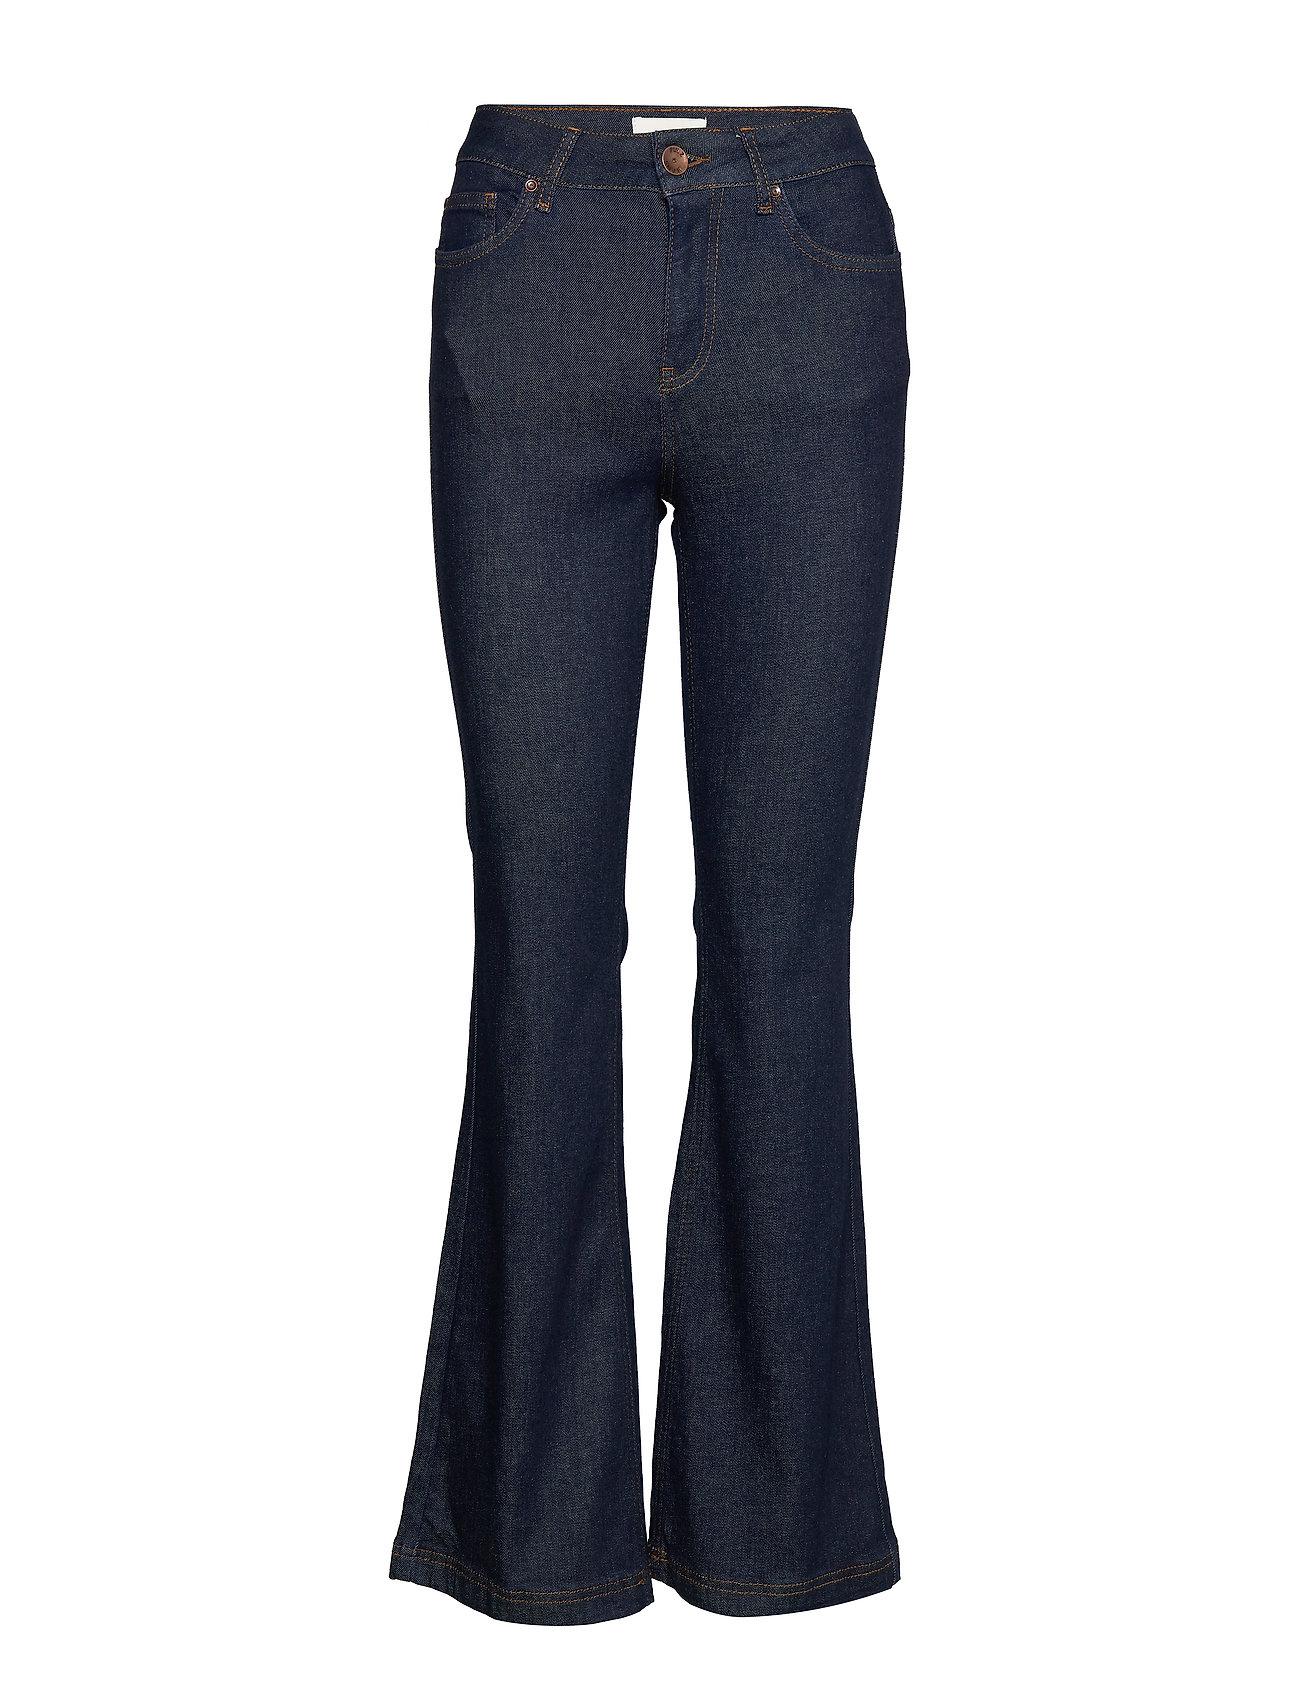 Pulz Jeans PZLIVA Jeans - DARK BLUE DENIM